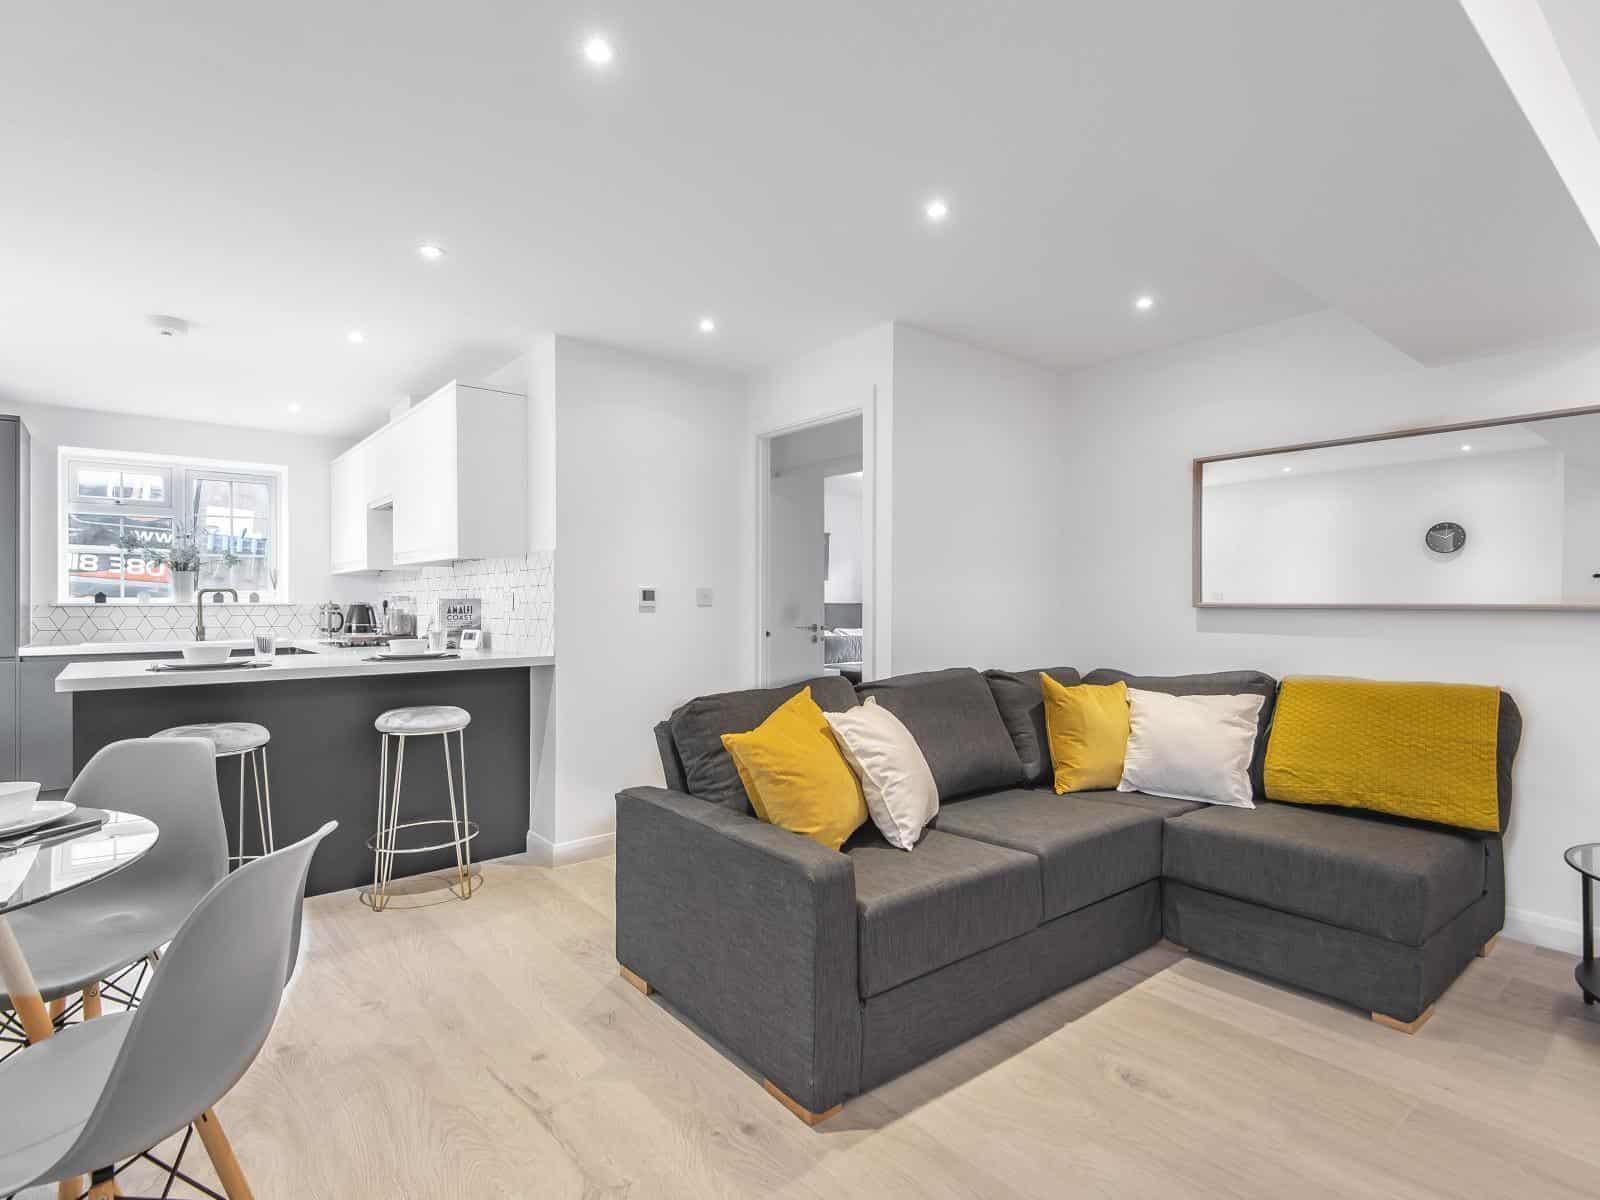 Basement Conversions in London